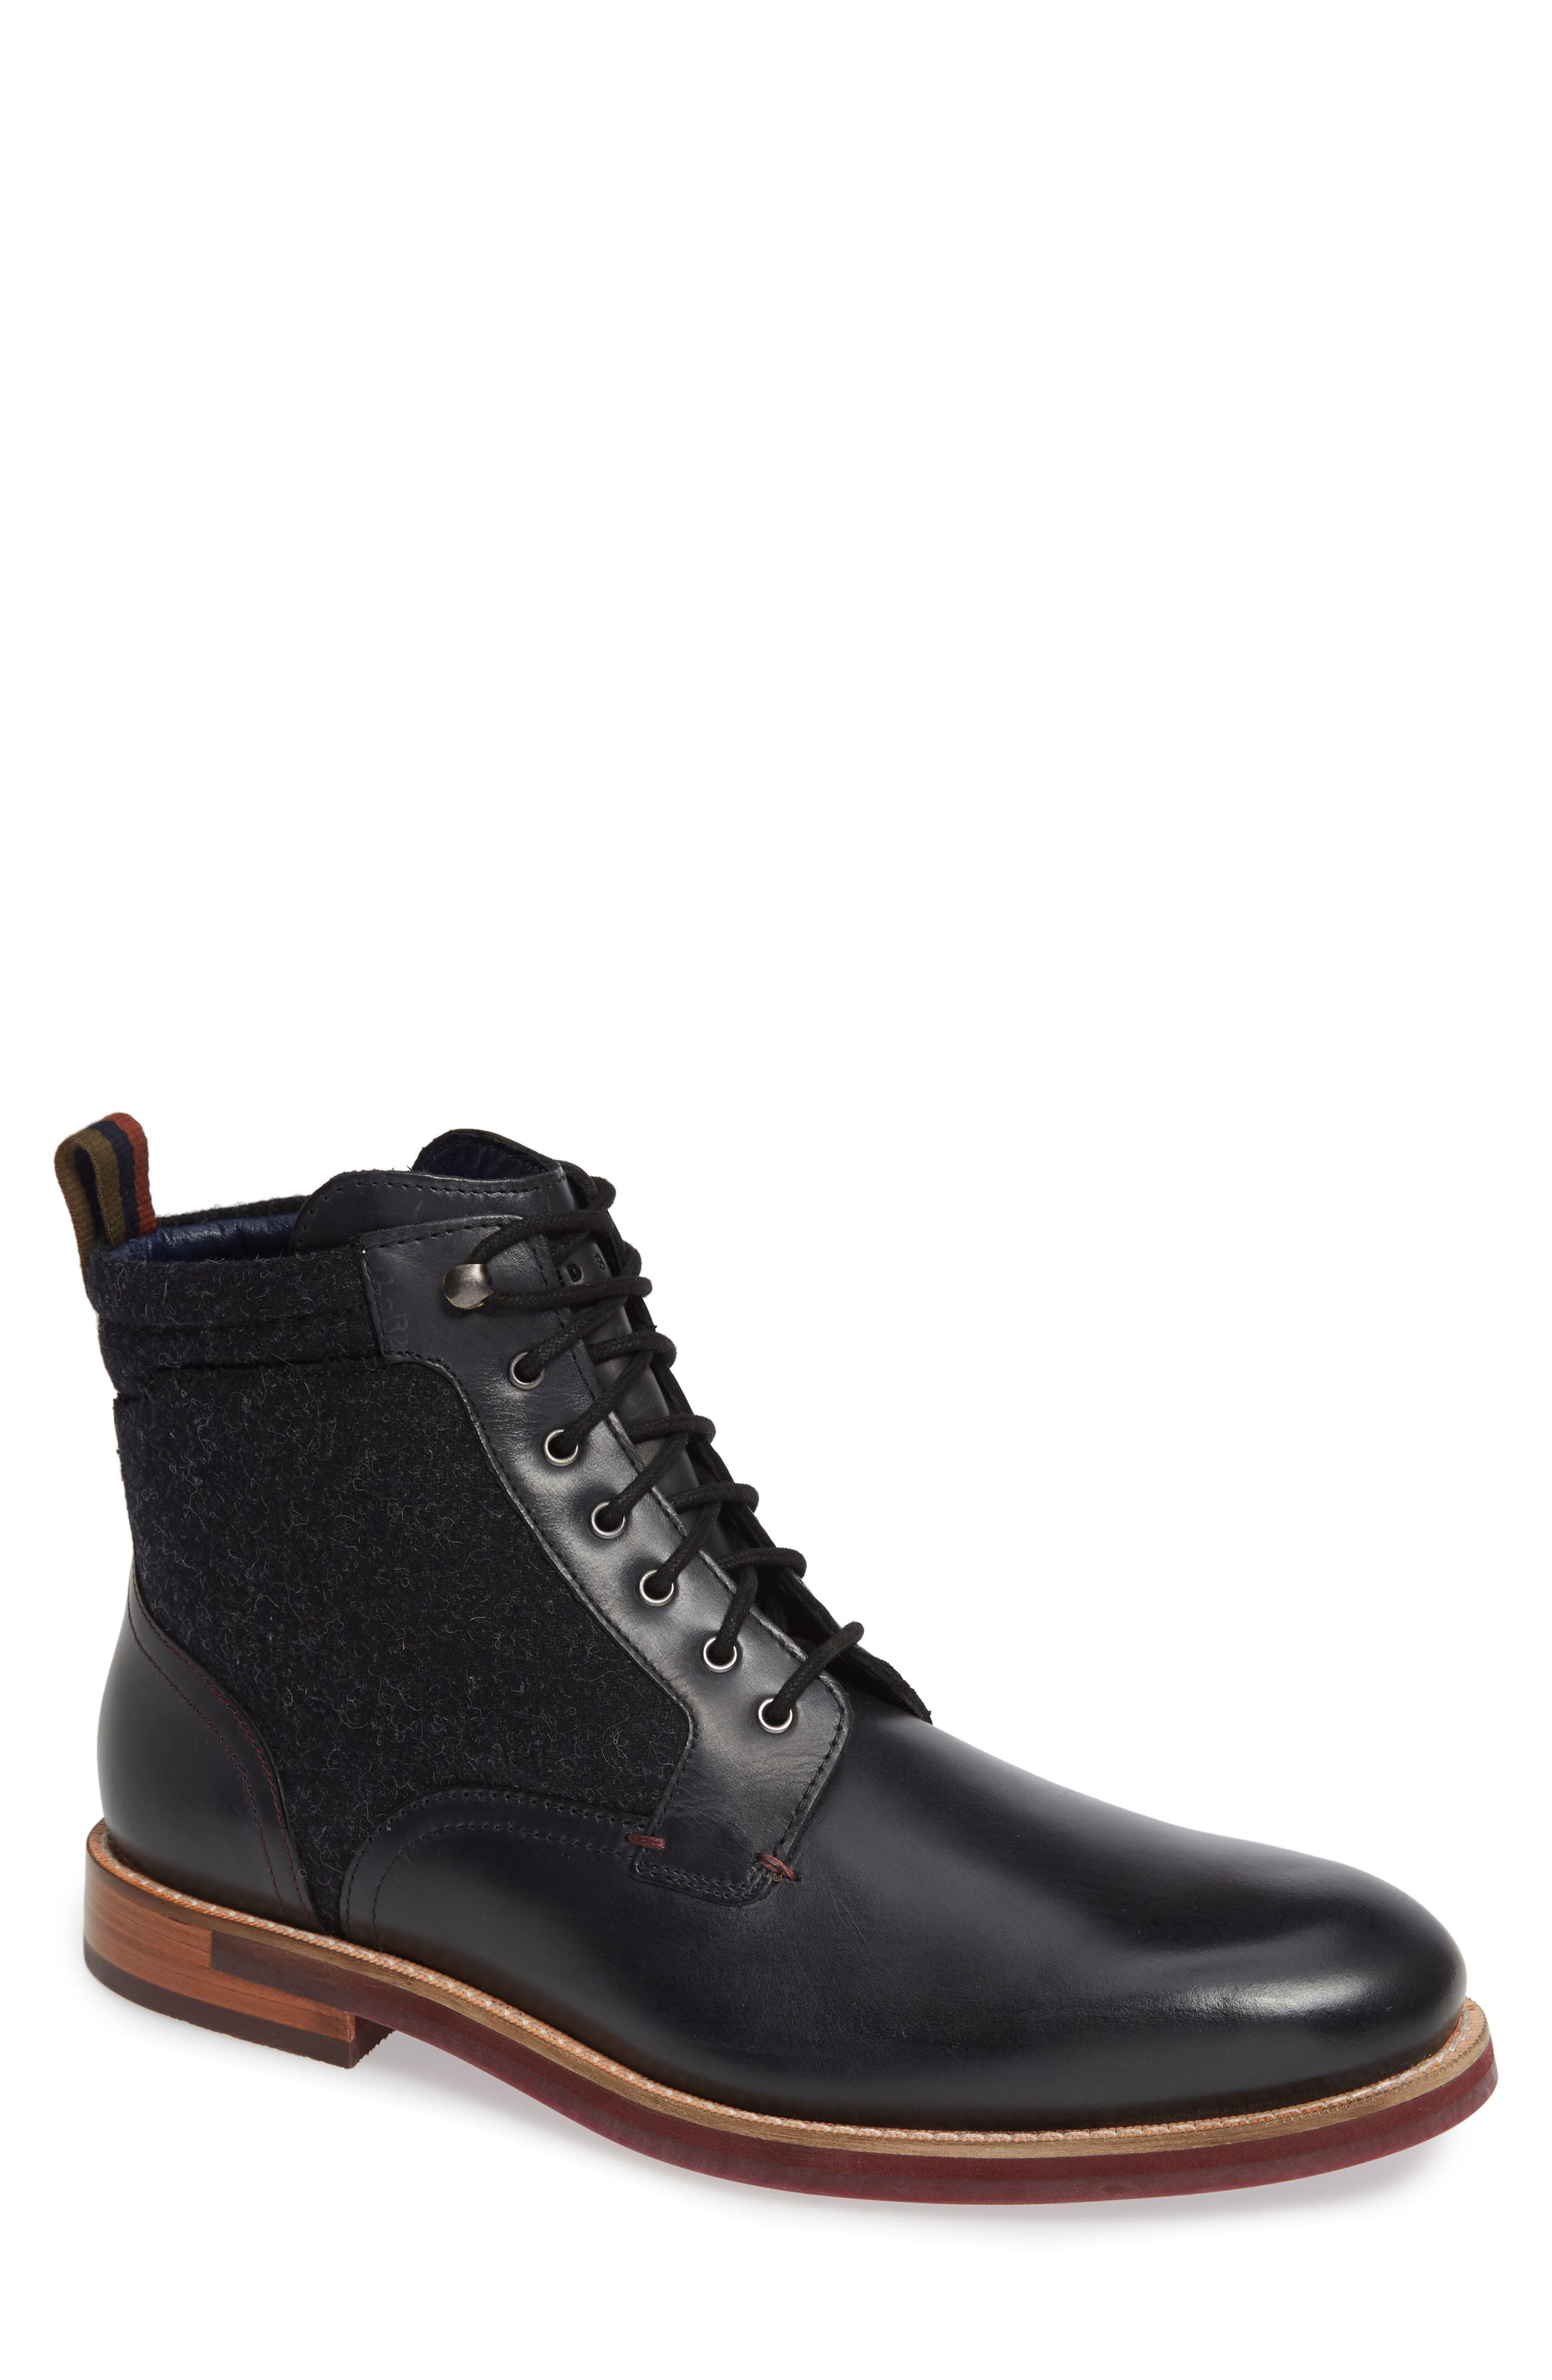 Axtoni Boot,                         Main,                         color, 001